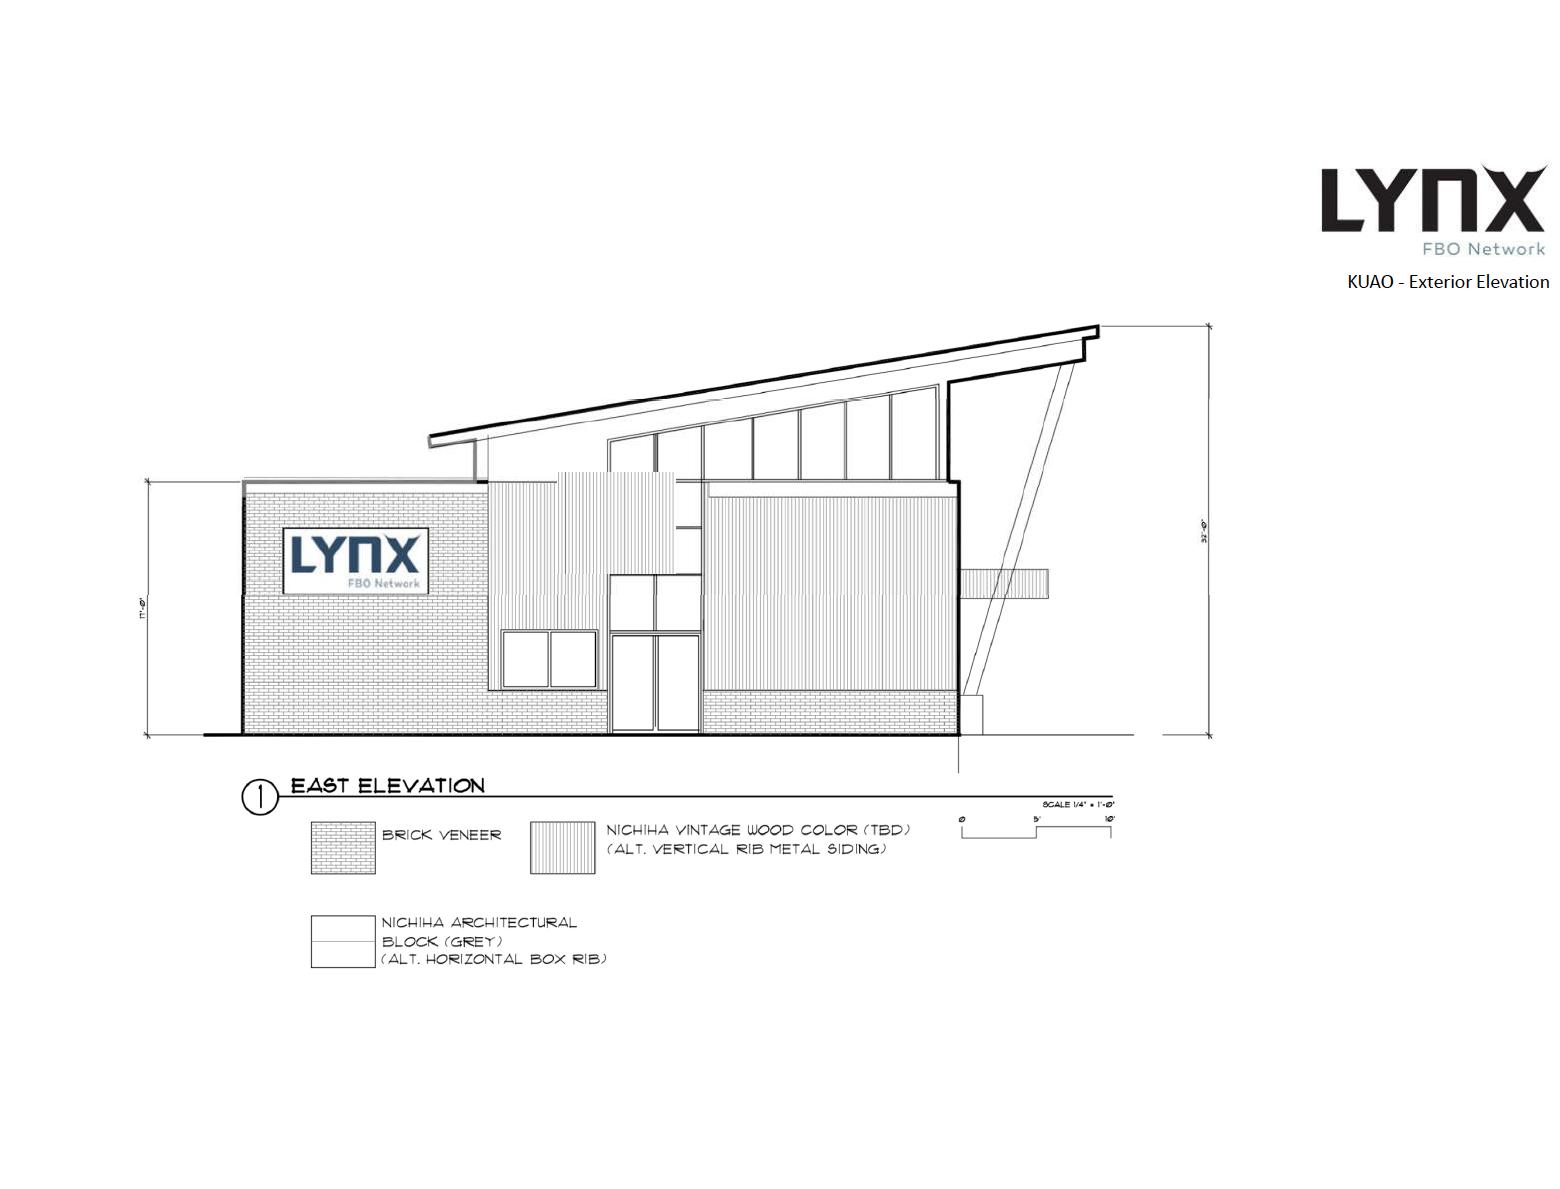 LYNX - Owners Representative